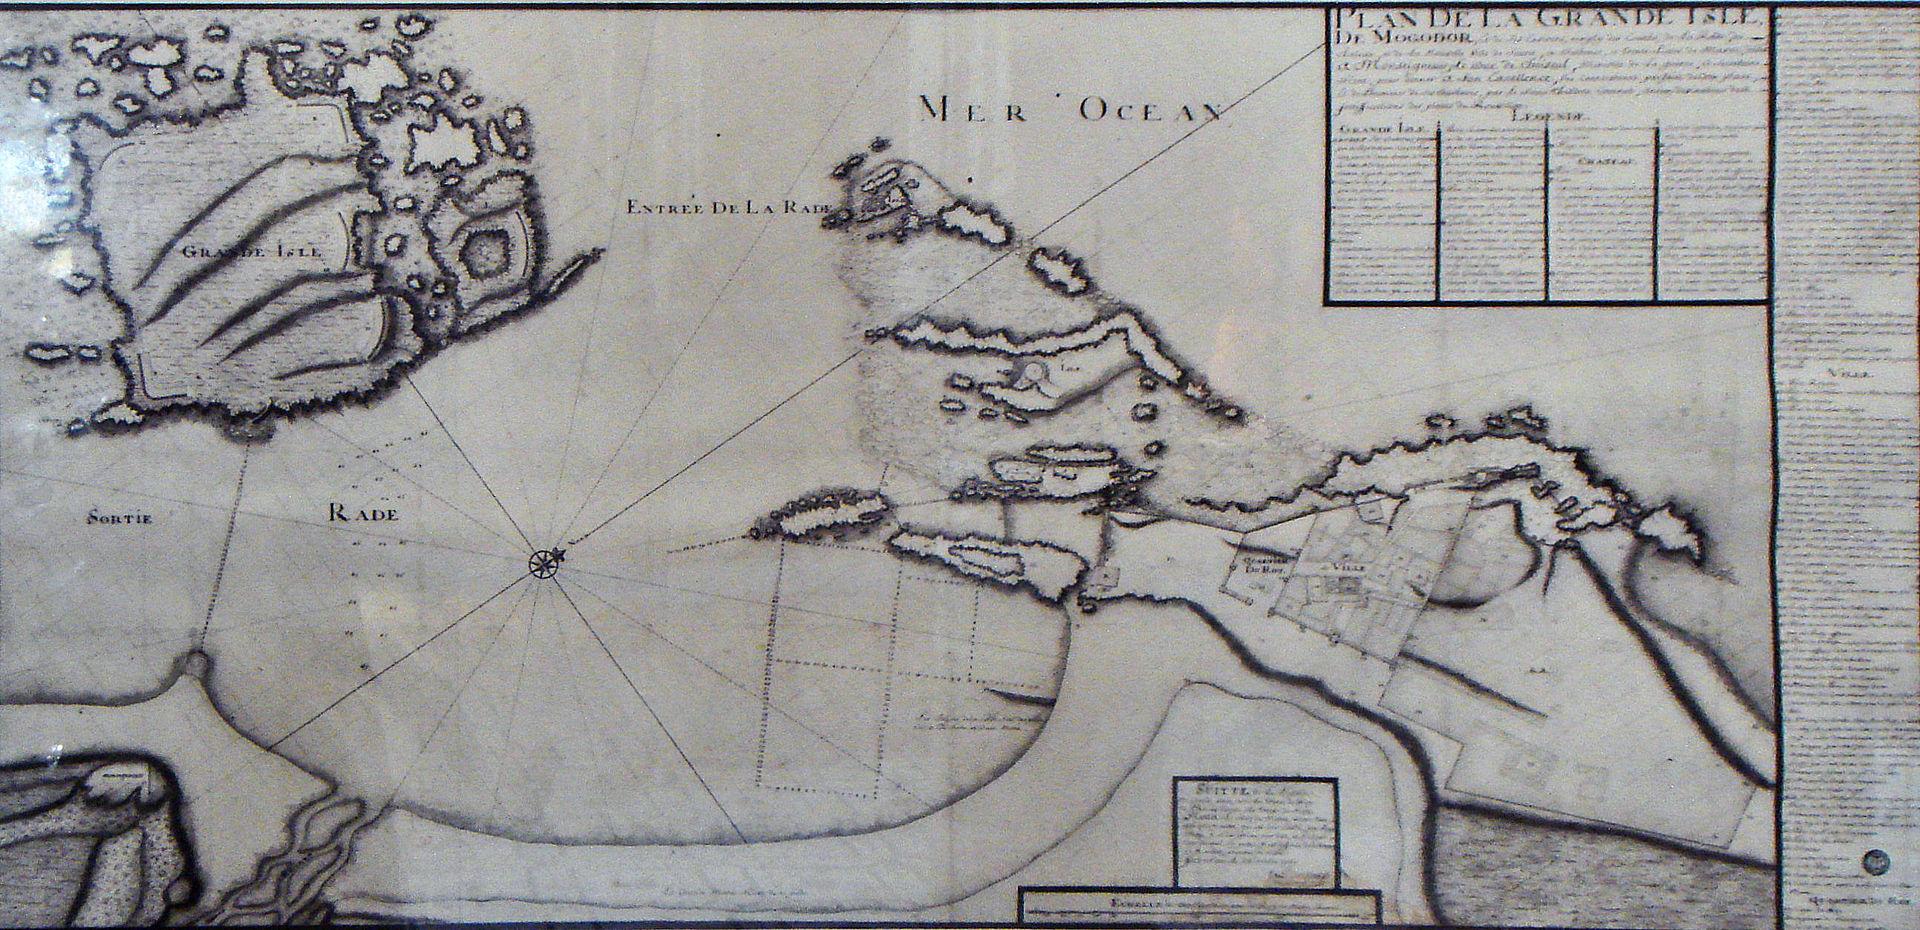 Map Mogador Essaouira by Theodore Cornut 1767